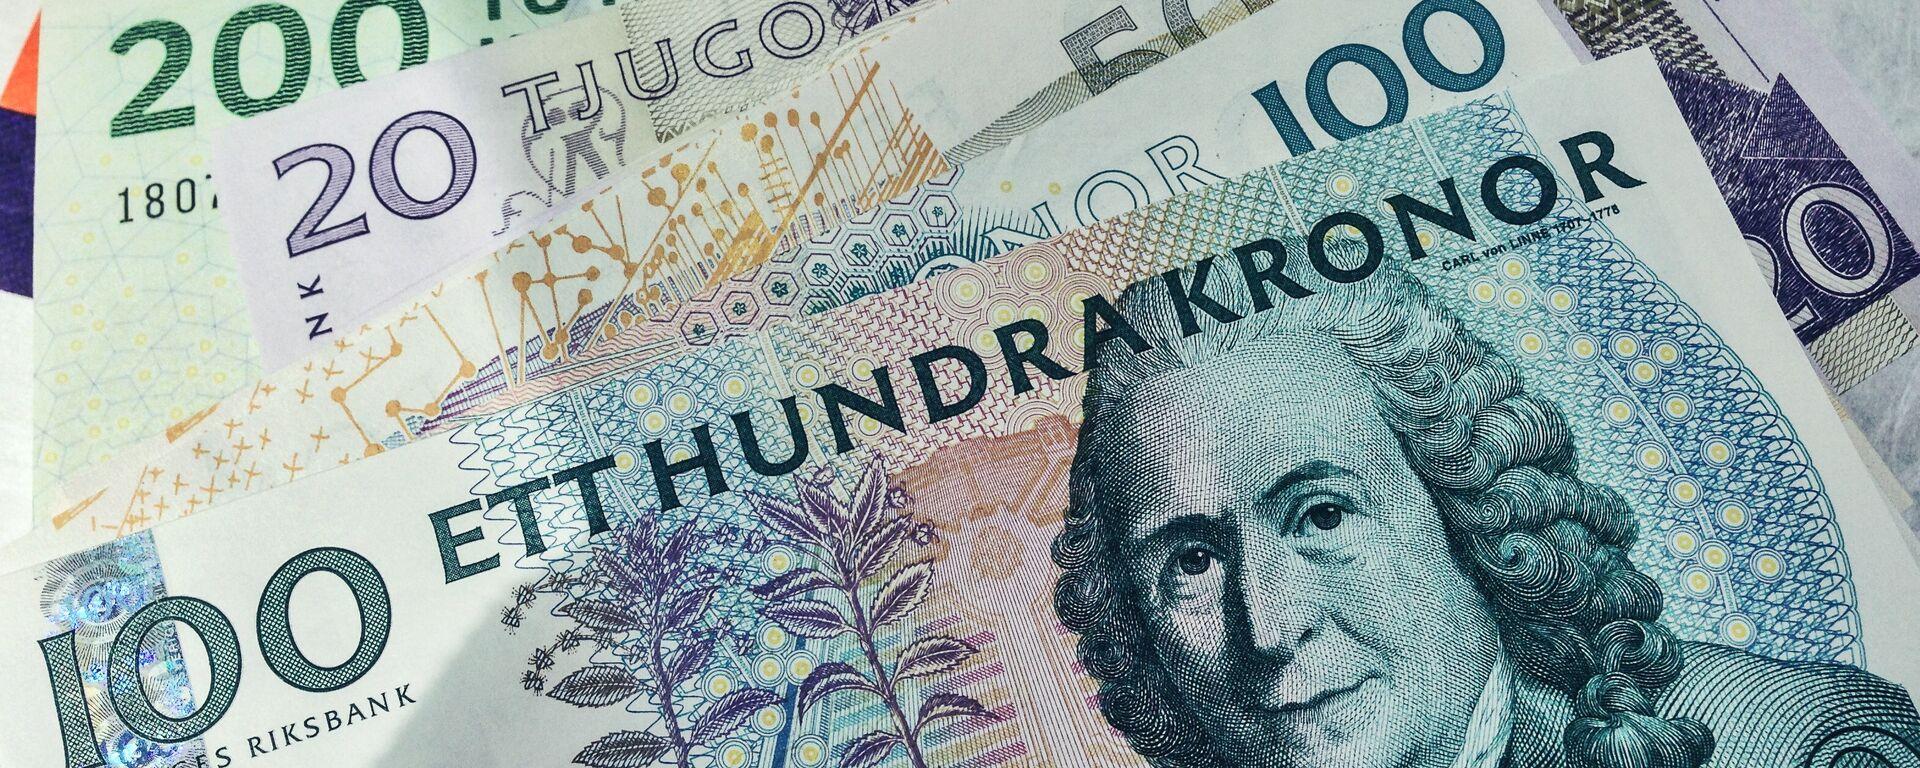 Moneta svedese e danese - Sputnik Italia, 1920, 18.12.2020